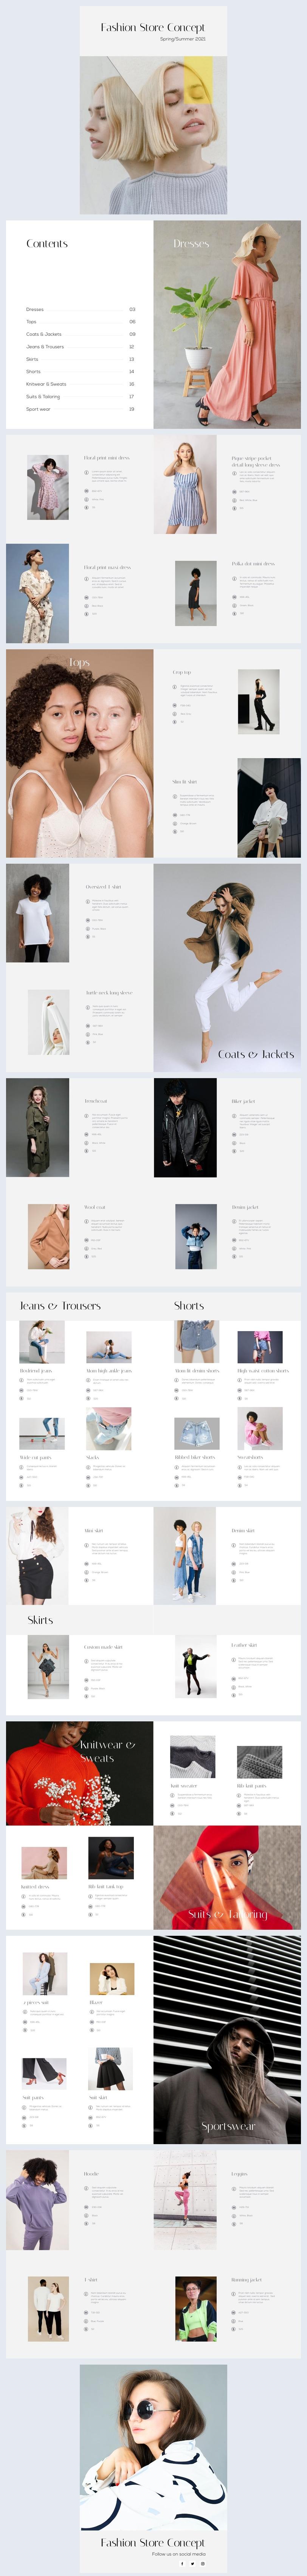 Ejemplo de diseño para catálogo automatizado de productos de moda